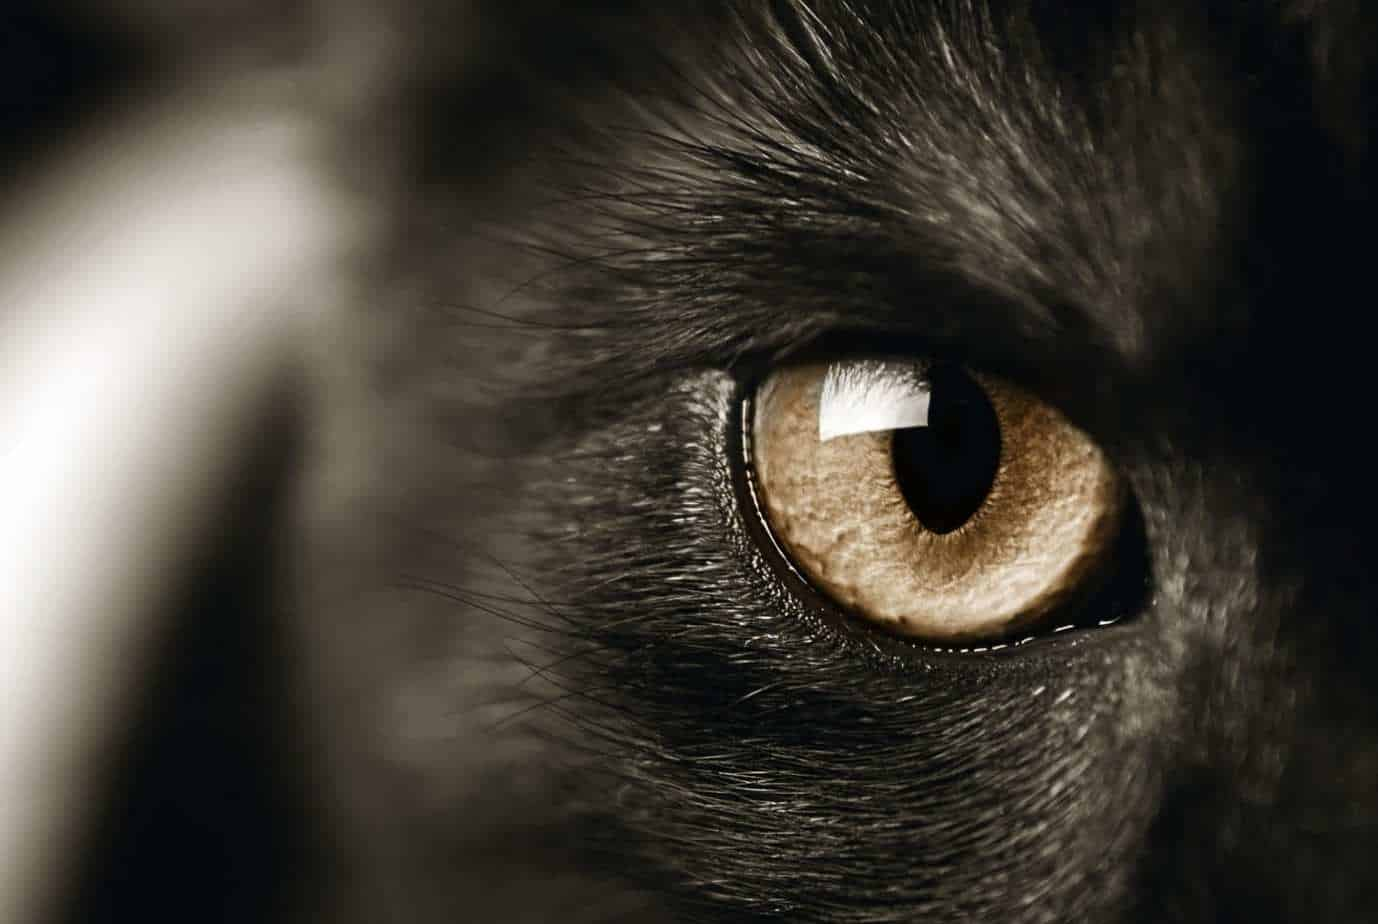 Obsessive compulsive disorder in cats